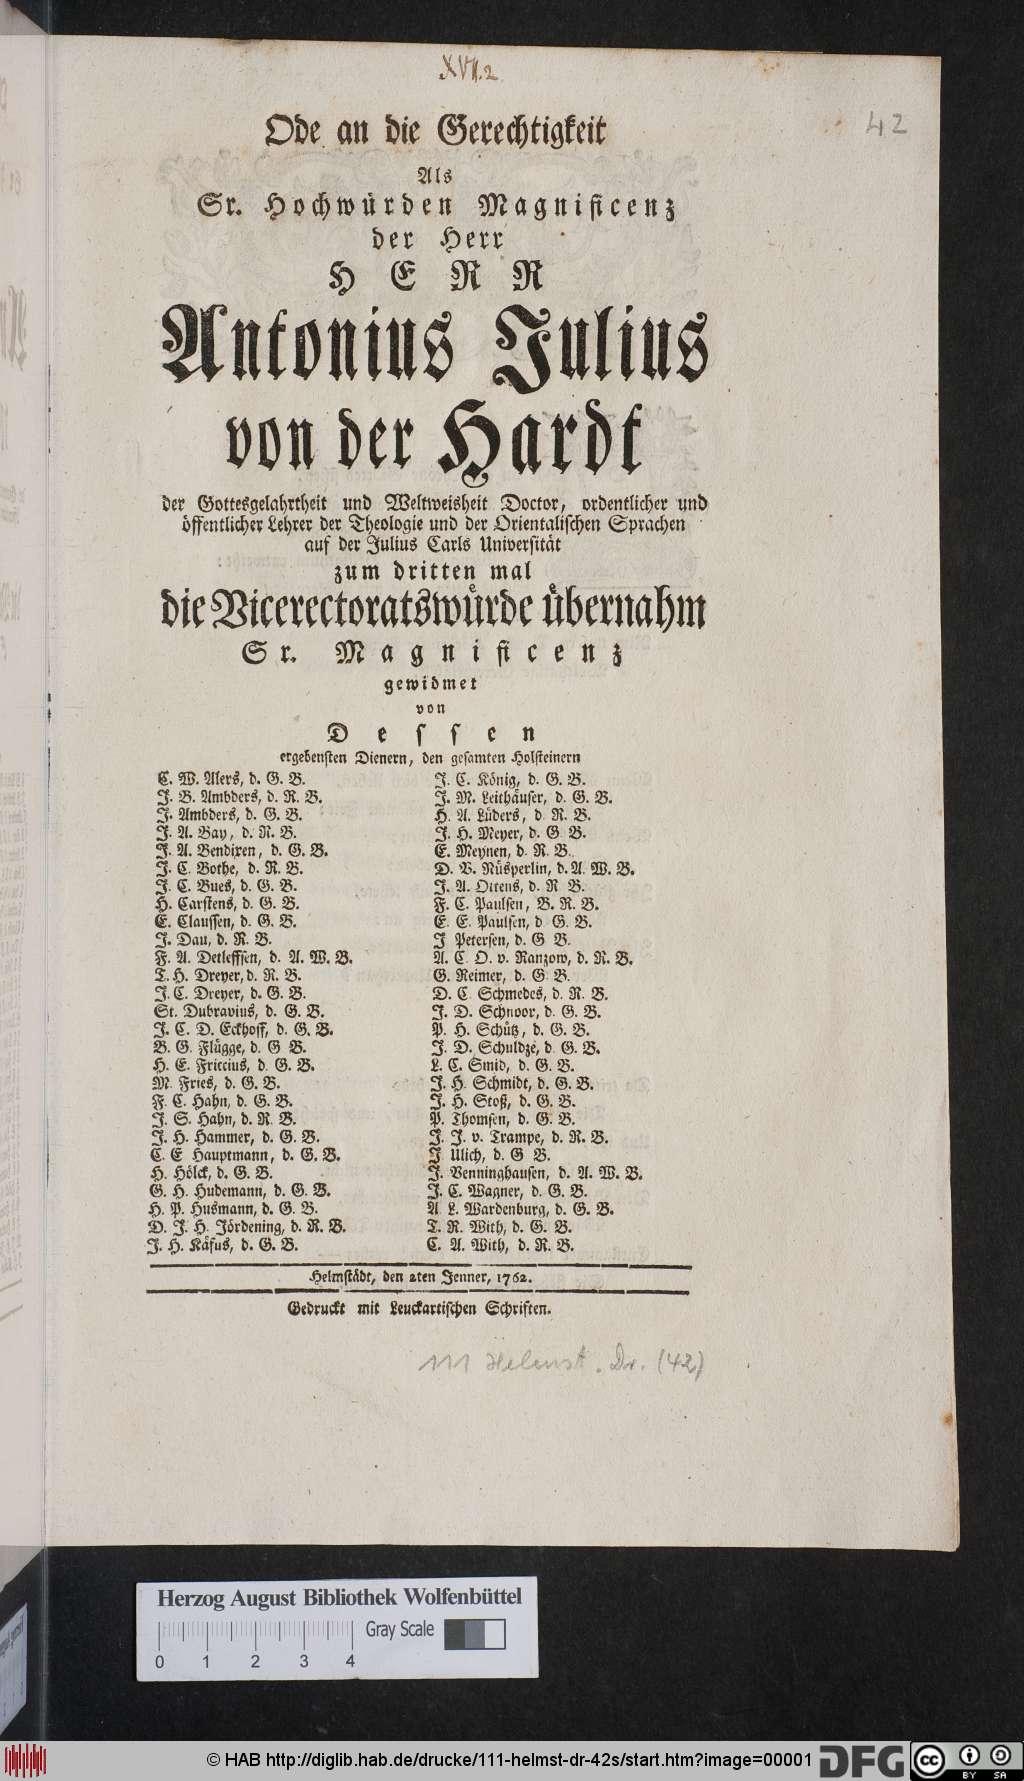 https://diglib.hab.de/drucke/111-helmst-dr-42s/00001.jpg